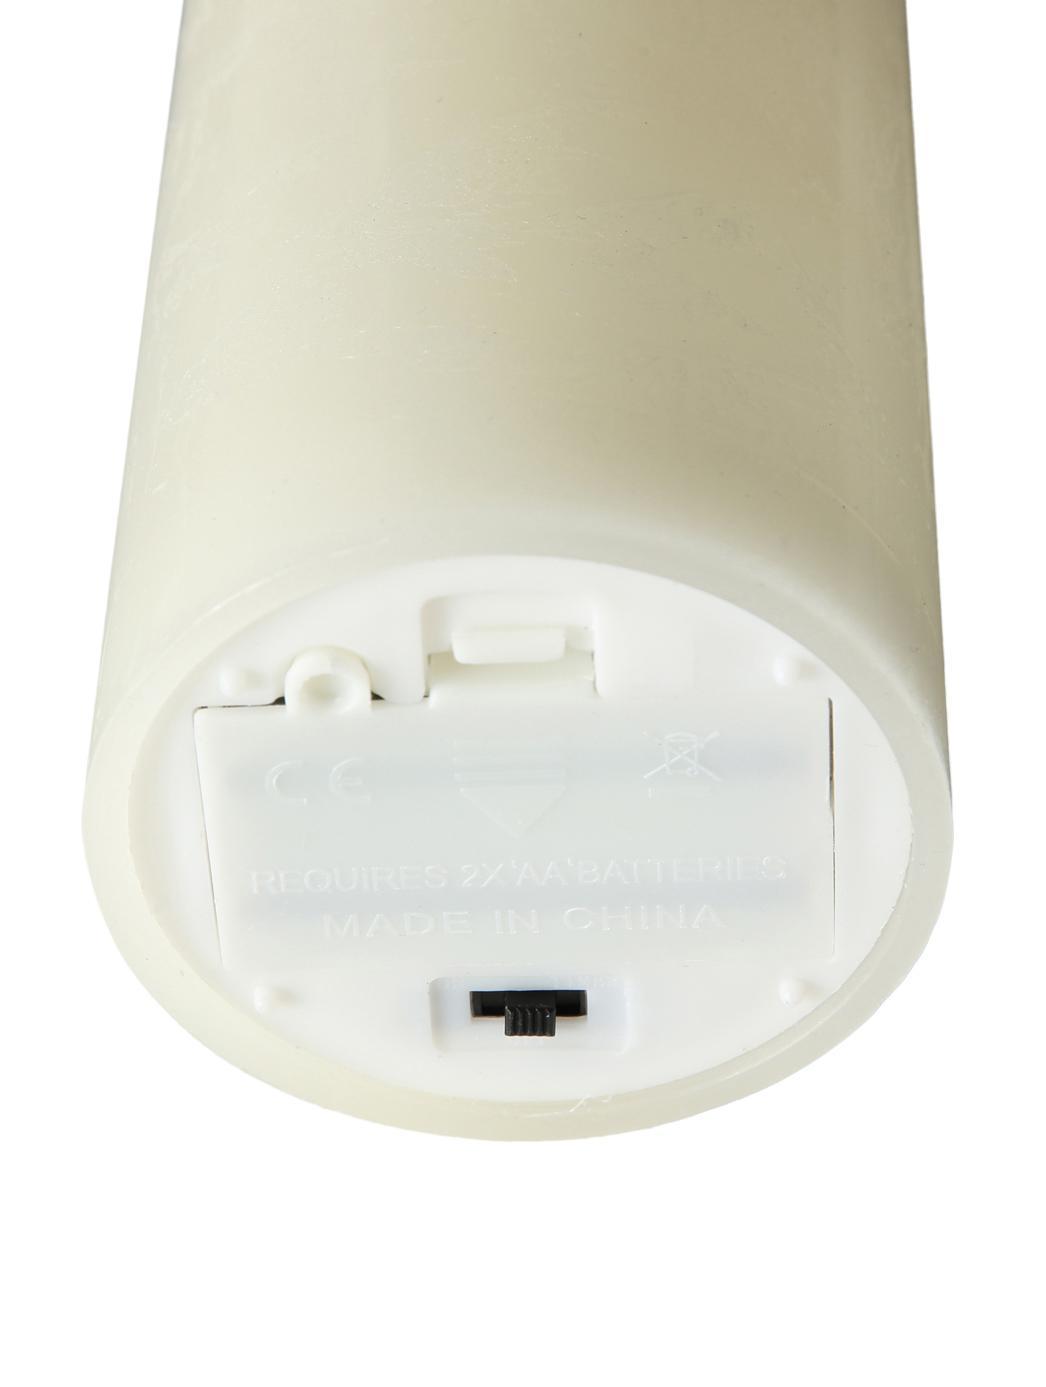 LED Kerze Bino, Cremefarben, Ø 8 x H 15 cm